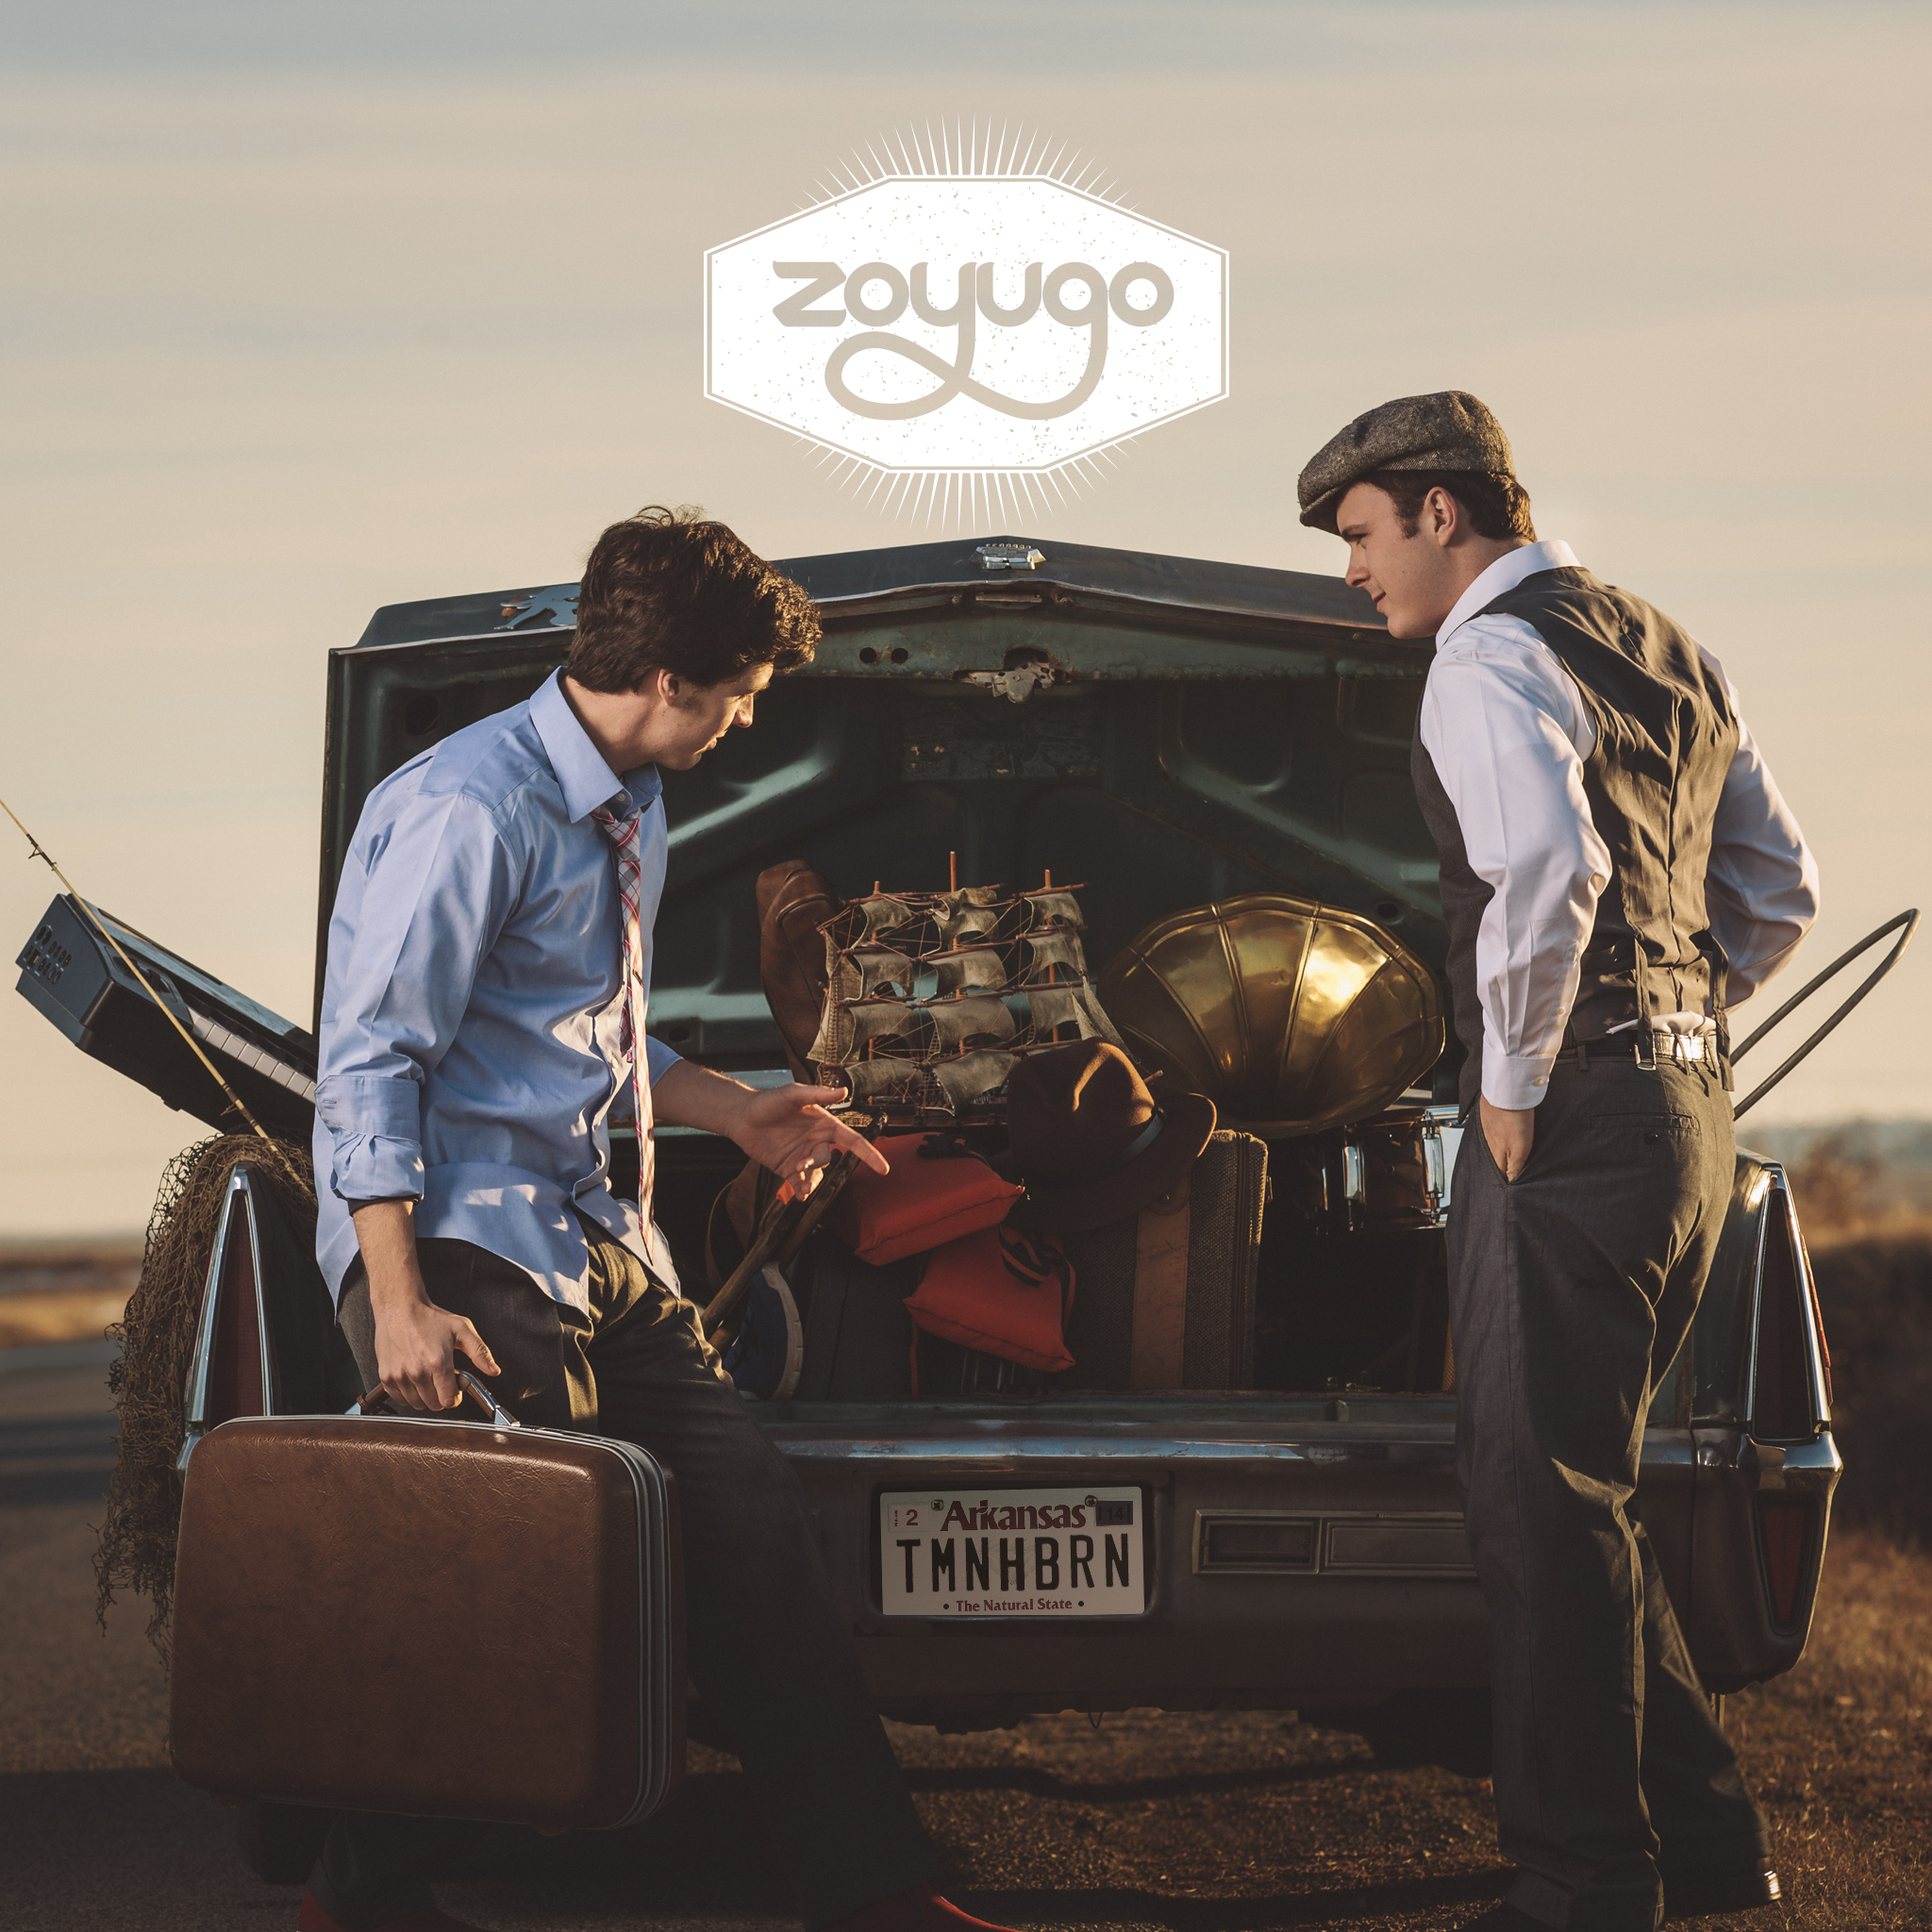 Tom & Hebron's sophomore album, Zoyugo.